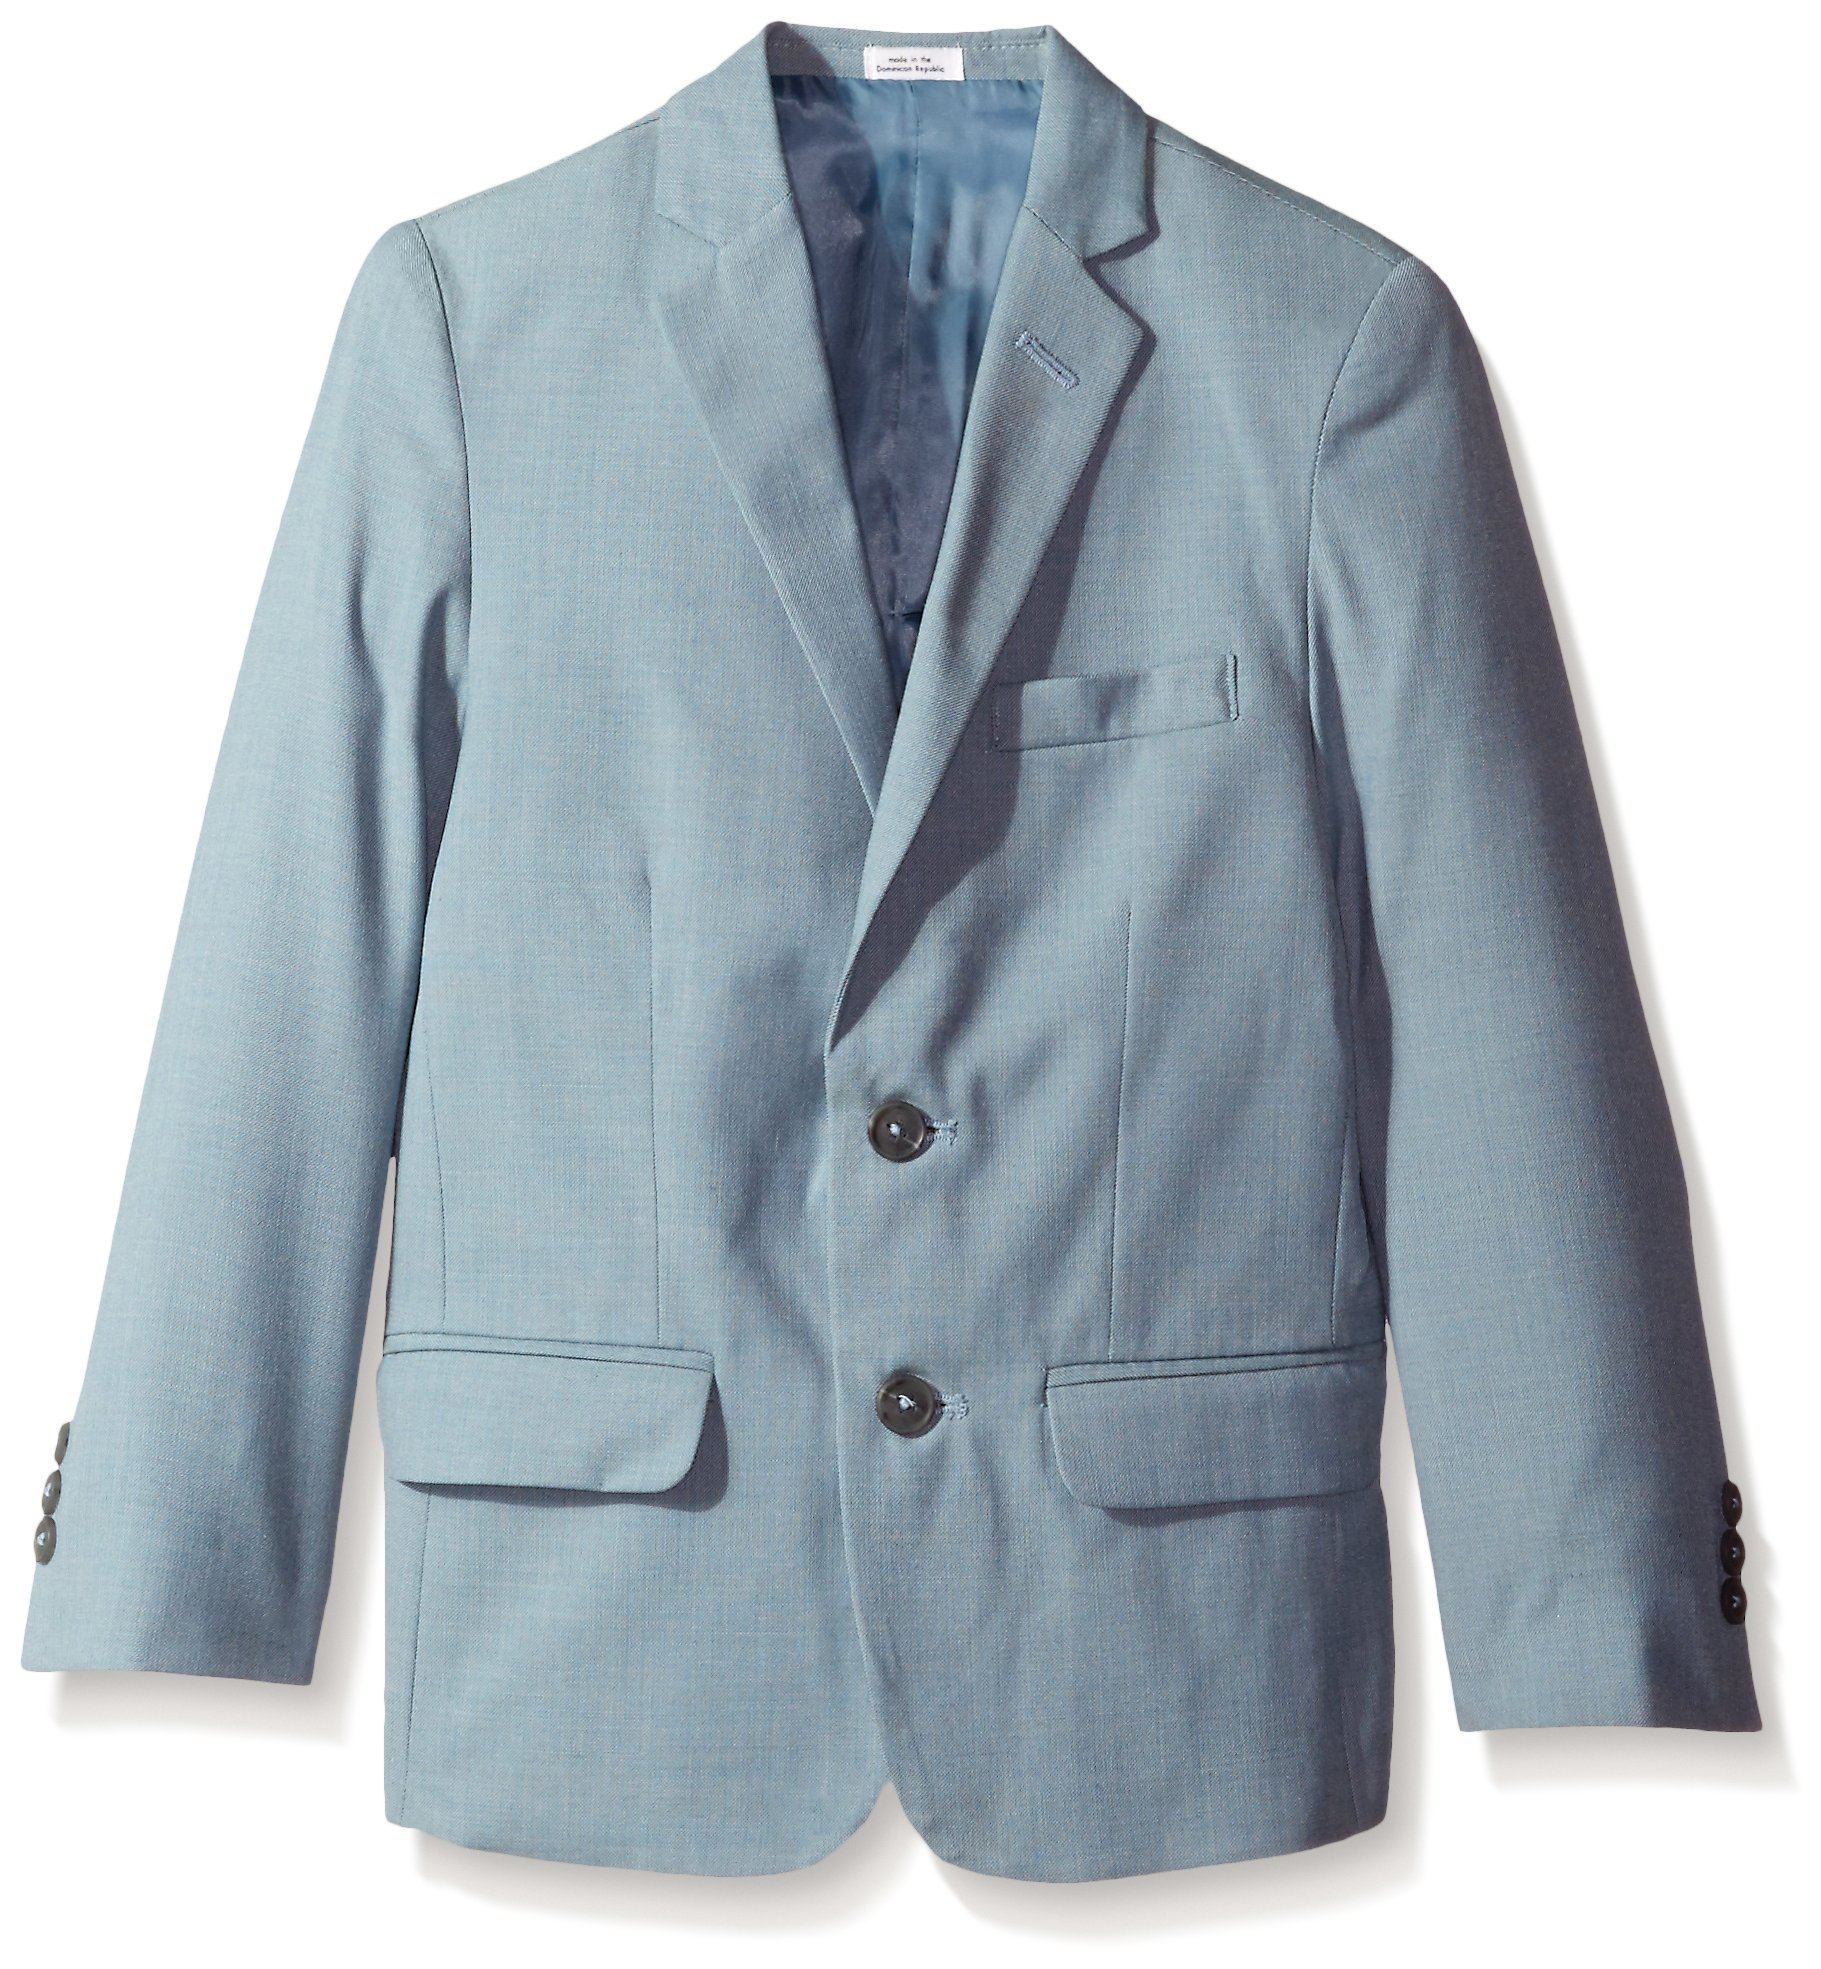 Calvin Klein Big Boys' Striated Sharkskin Jacket, Medium Teal, 16